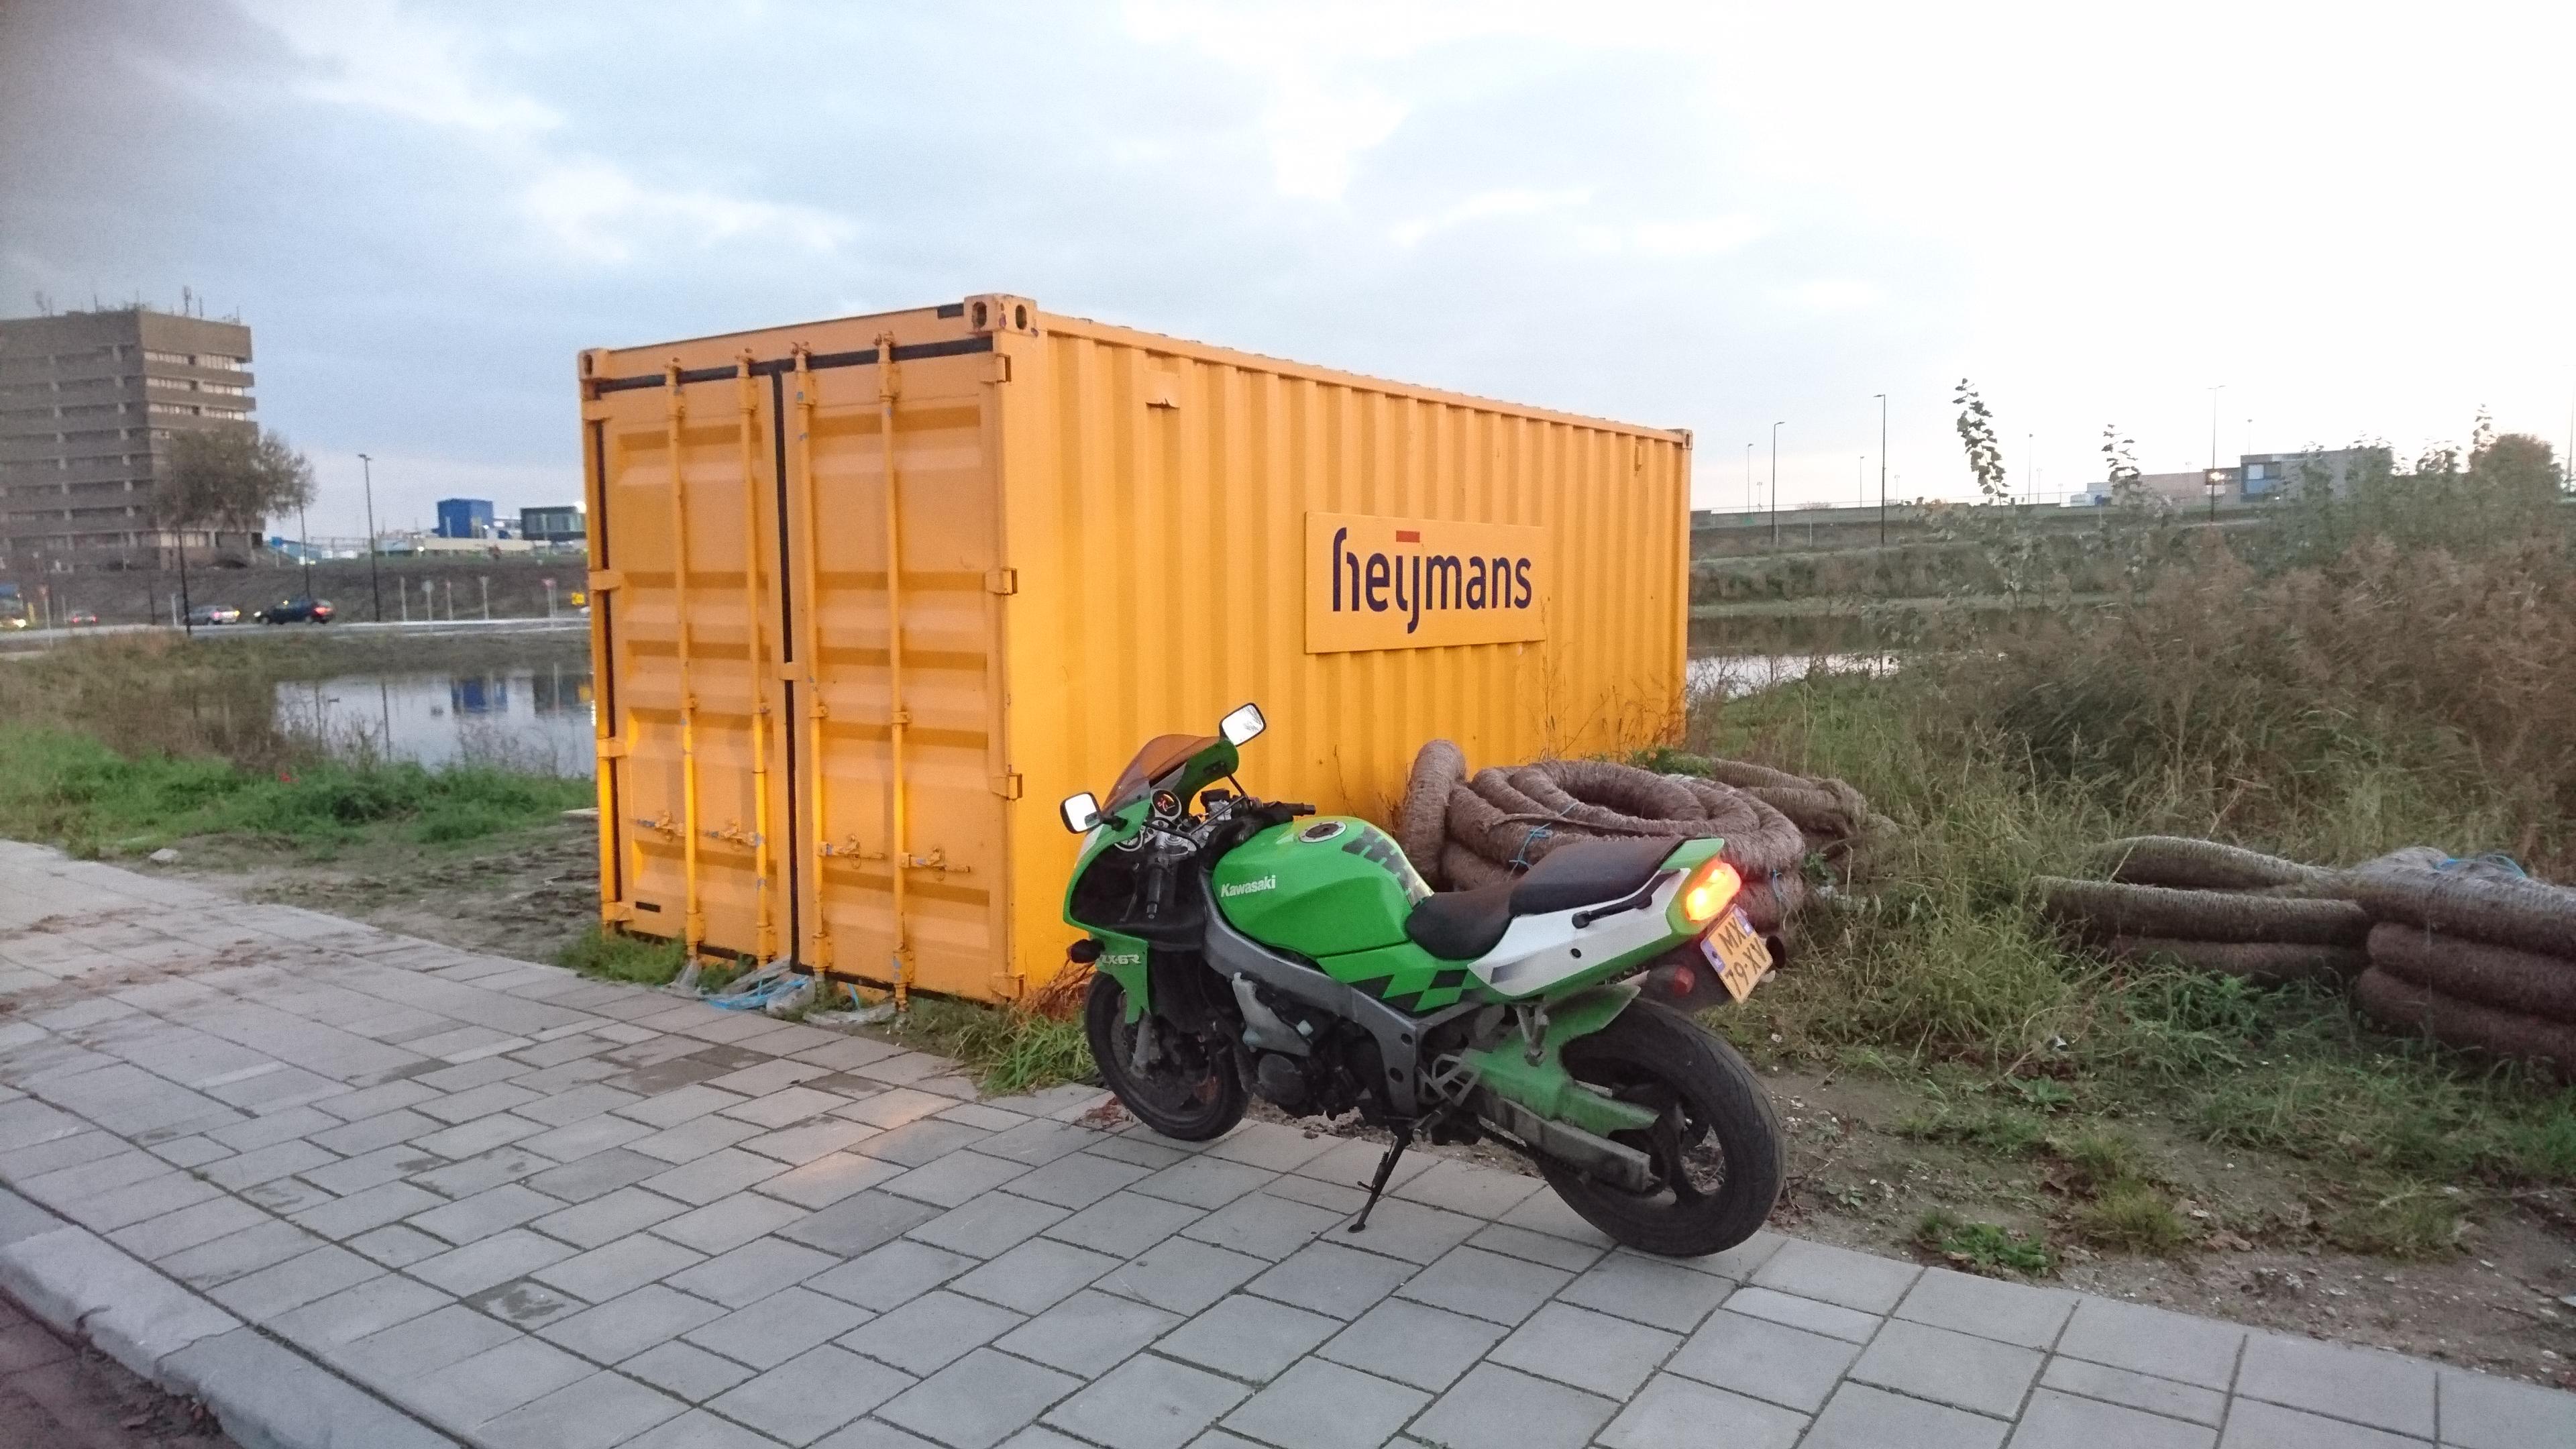 http://piczwart.nl/moto/punten/634.jpg